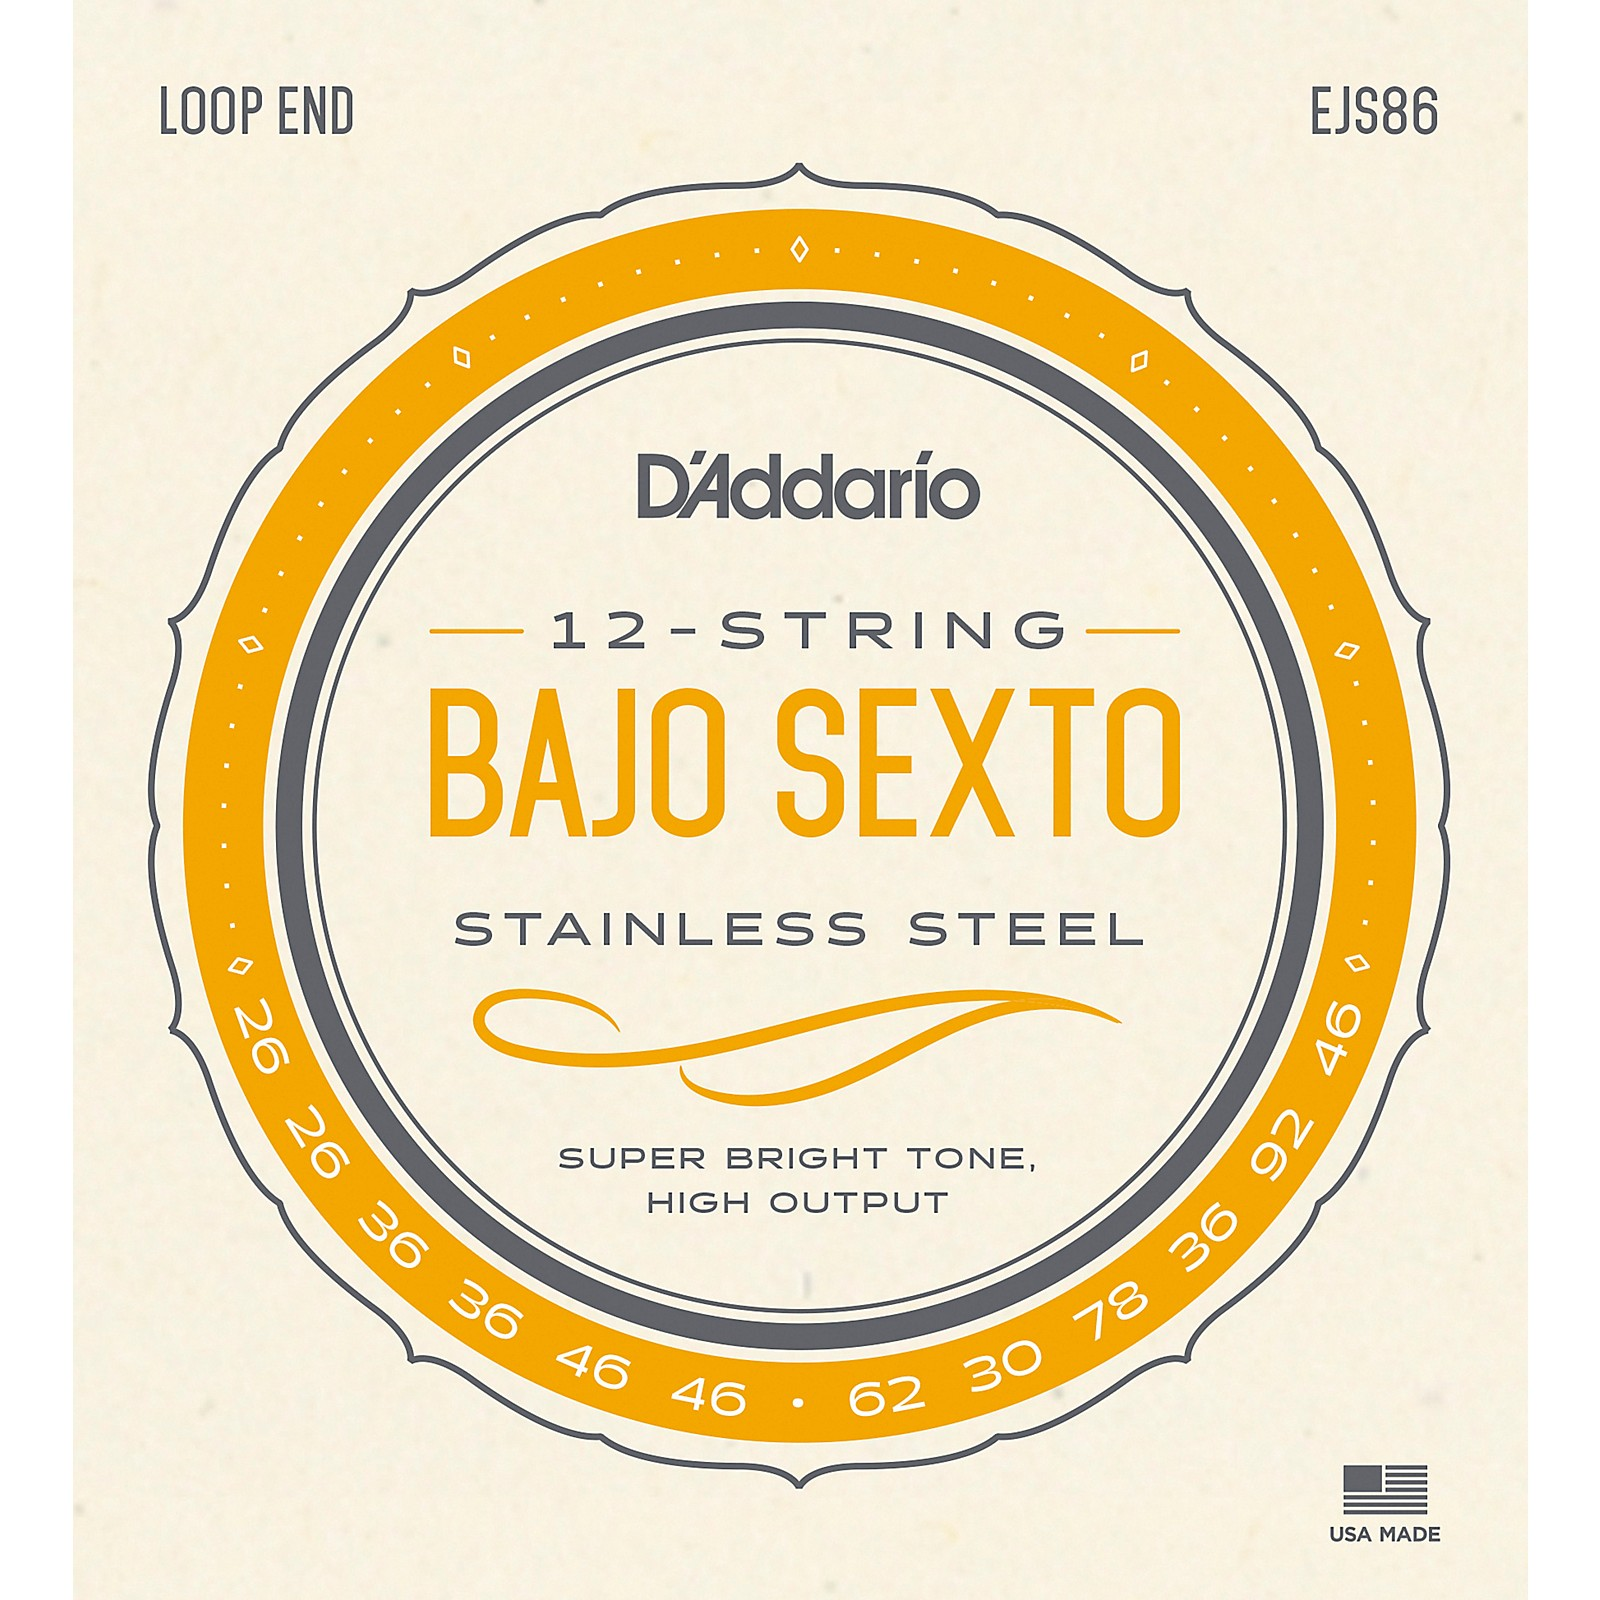 D'Addario Stainless Steel Bajo Sexto String Set